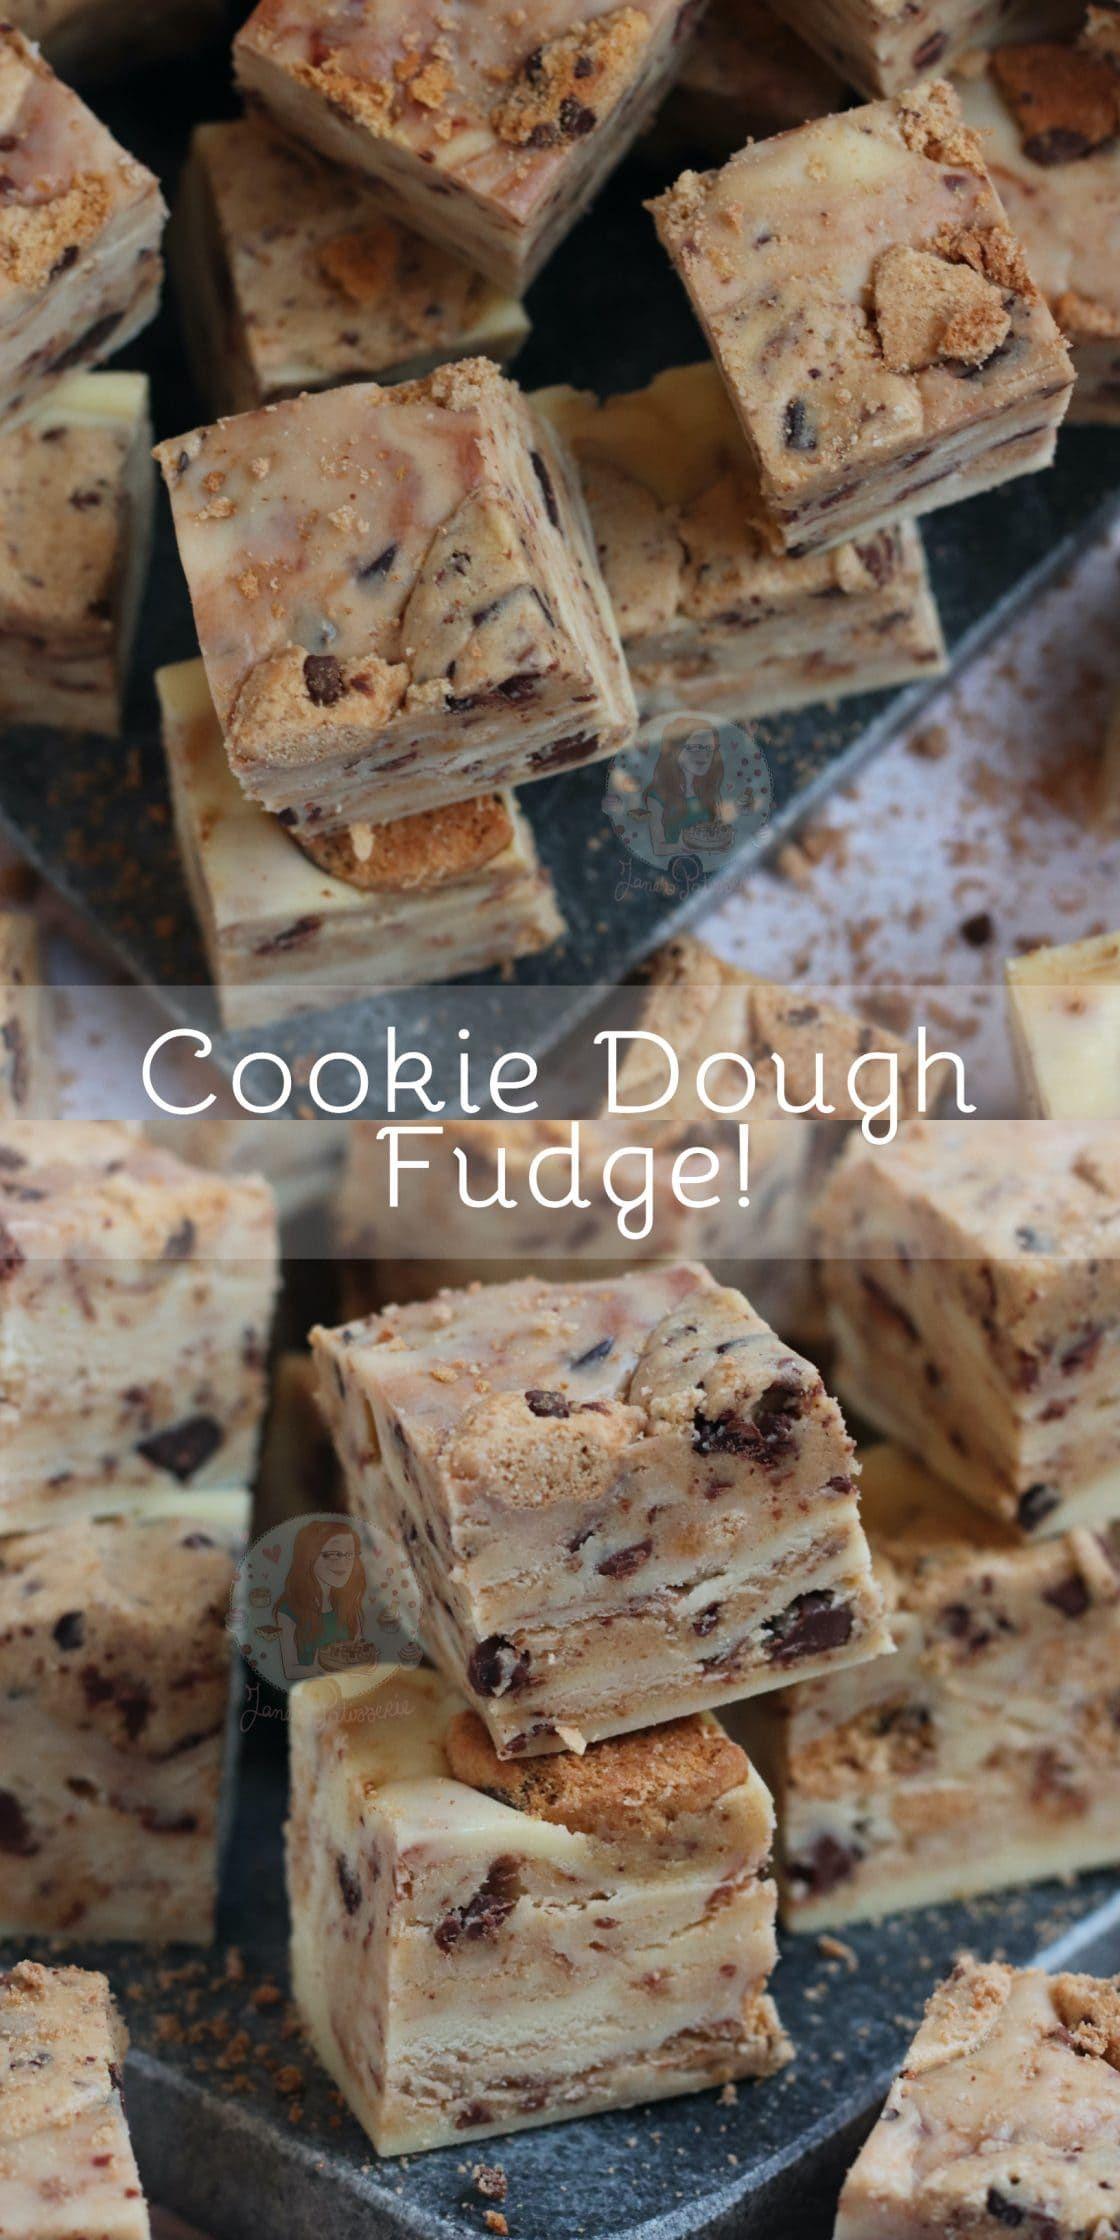 Cookie Dough Fudge Jane S Patisserie In 2020 Cookie Dough Fudge Fun Baking Recipes Homemade Fudge